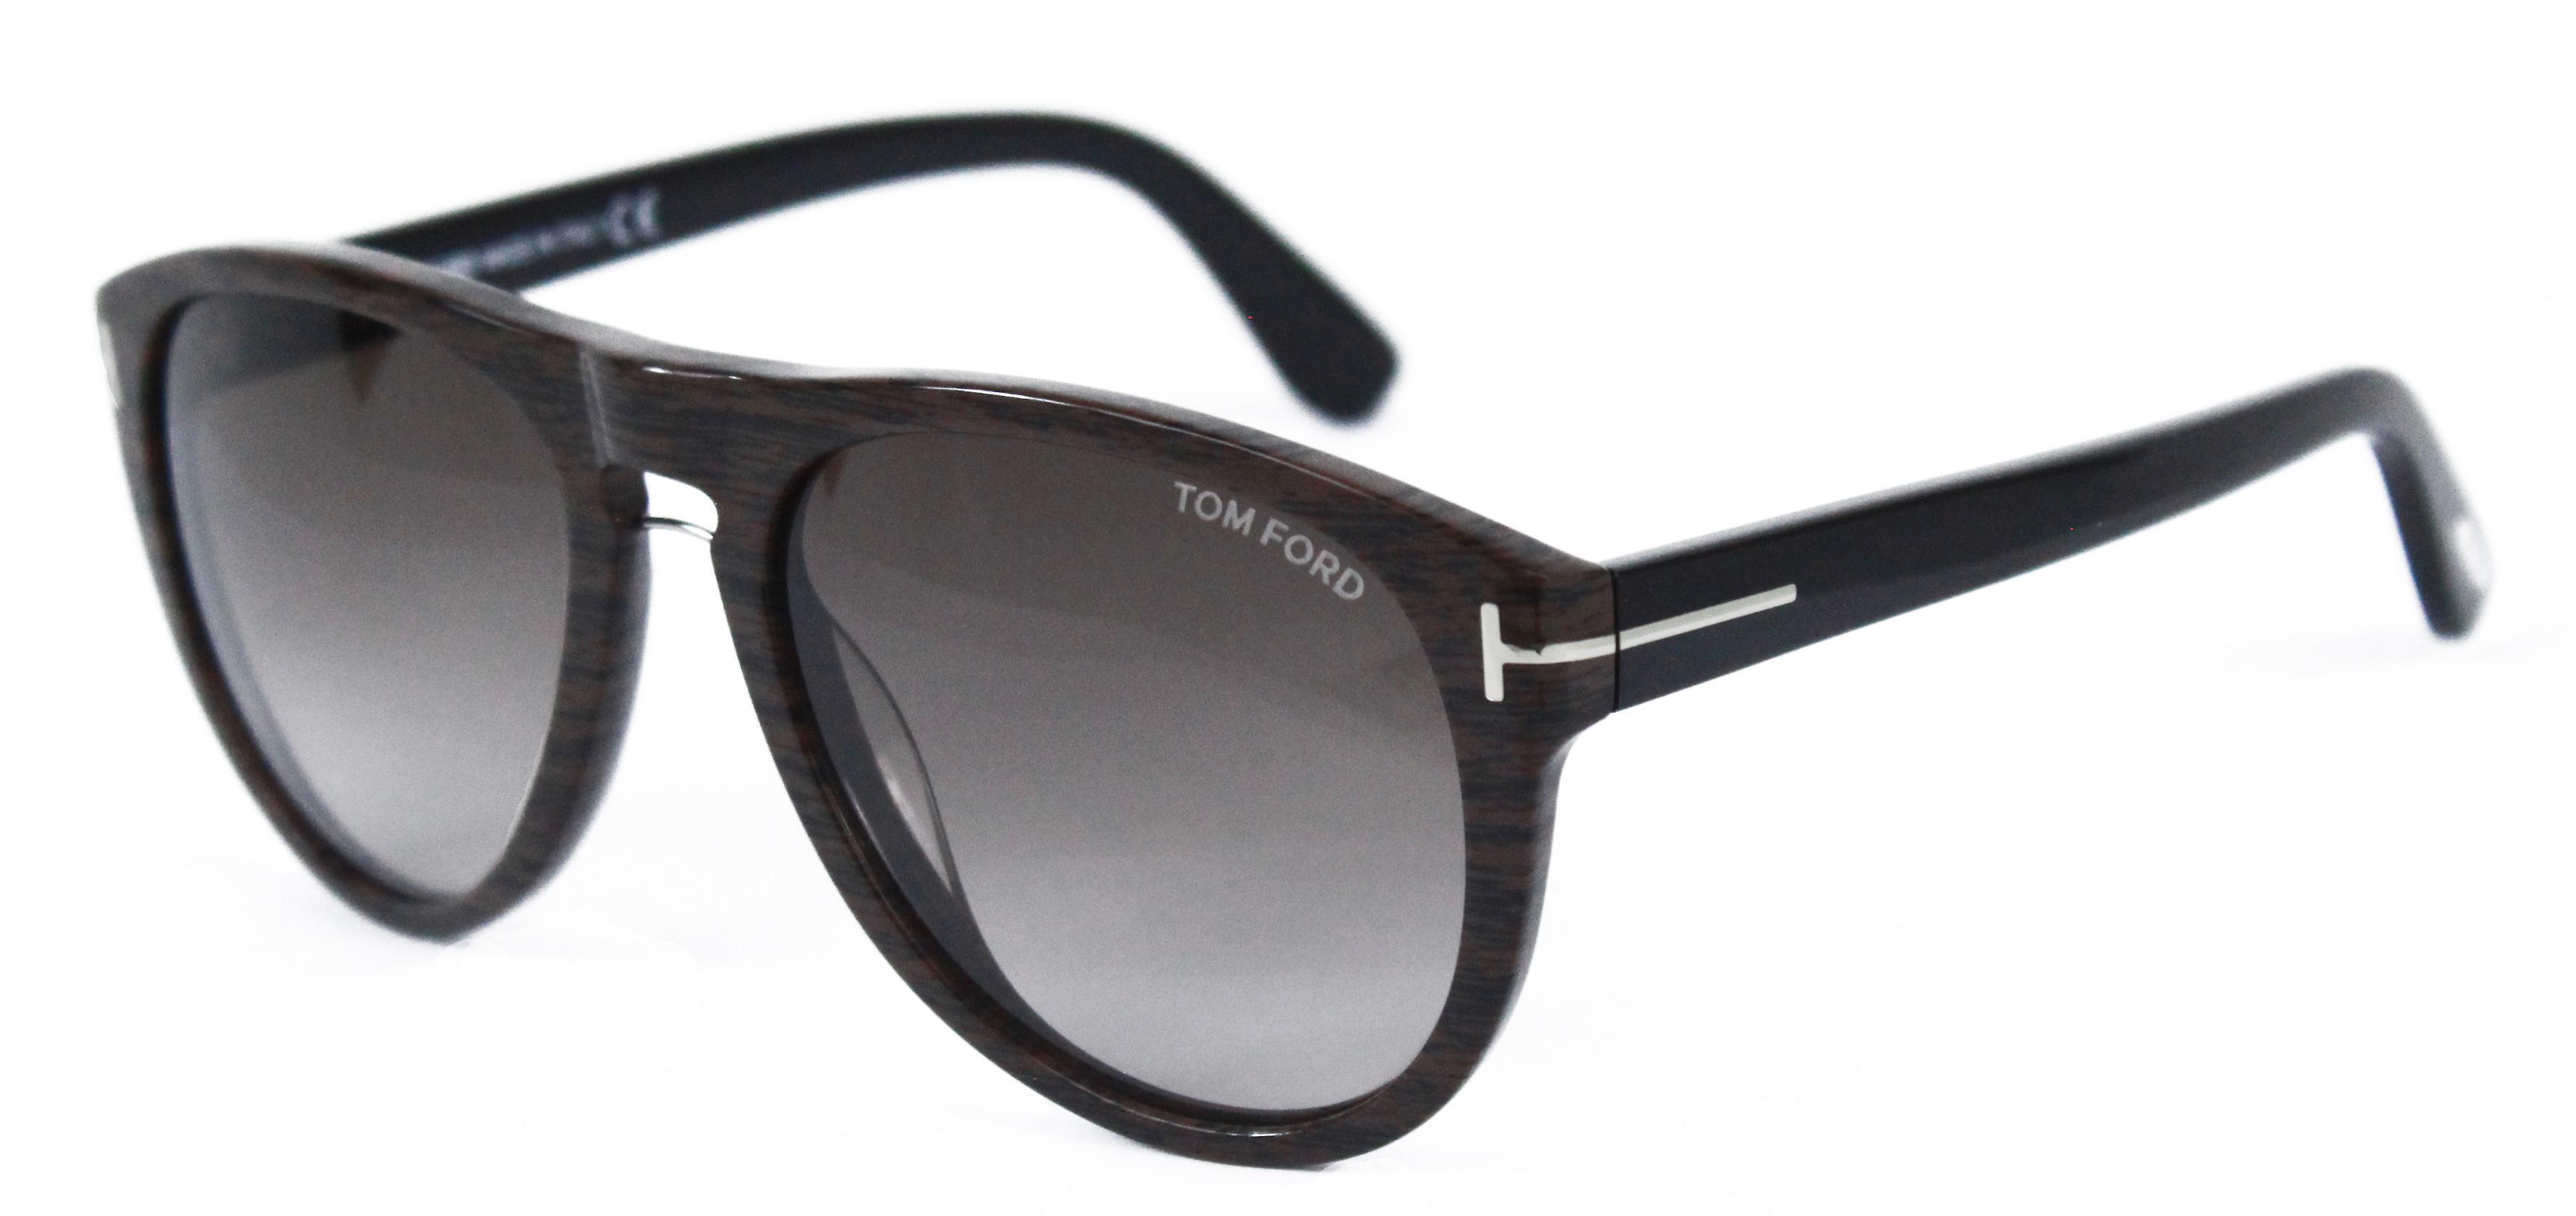 1eae1db6b توم فورد FT0347 كورت ك 05 النظارات الشمسية | Fruugo